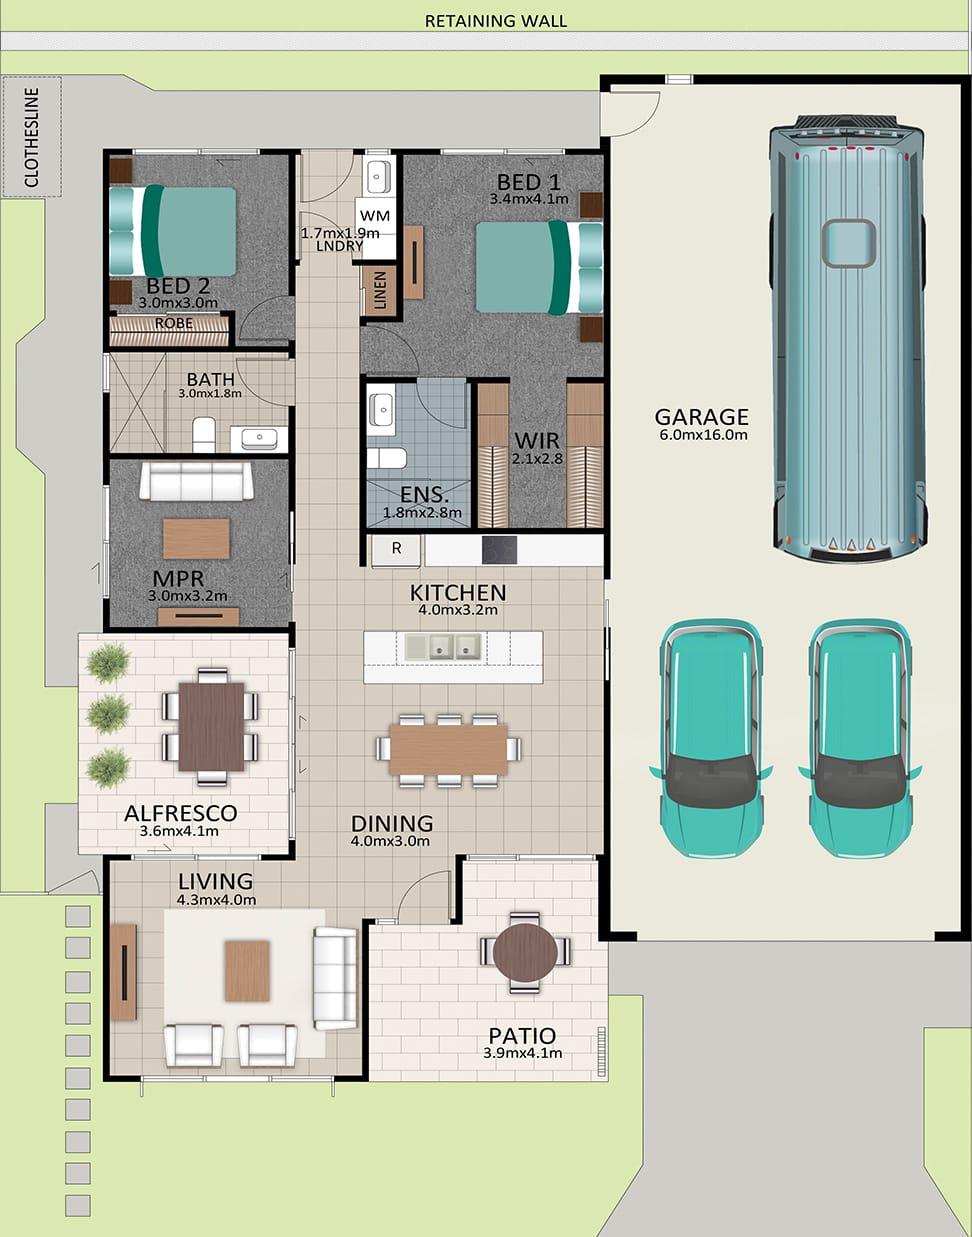 LAT25 Floorplan GAL OCT20 LOT 205 - Lot 205